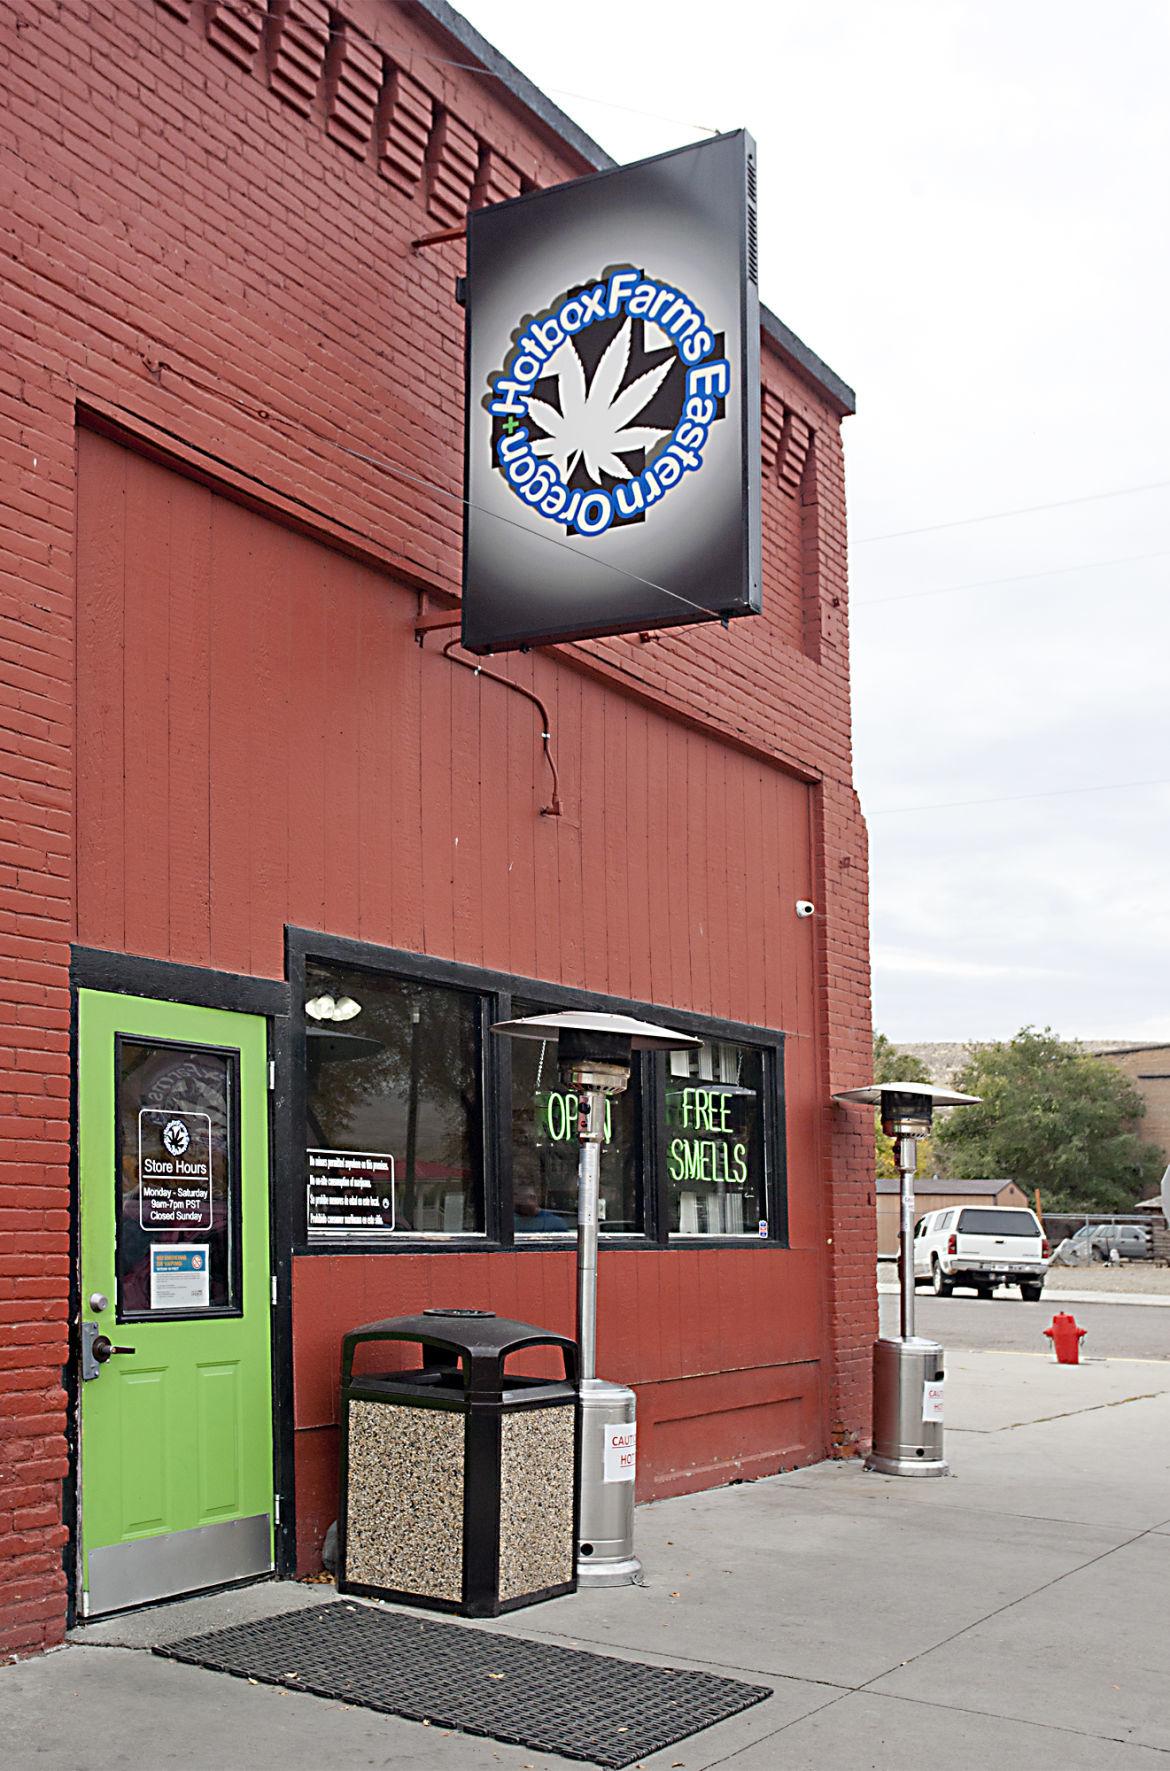 Oregon town on the Idaho border will vote on legal marijuana